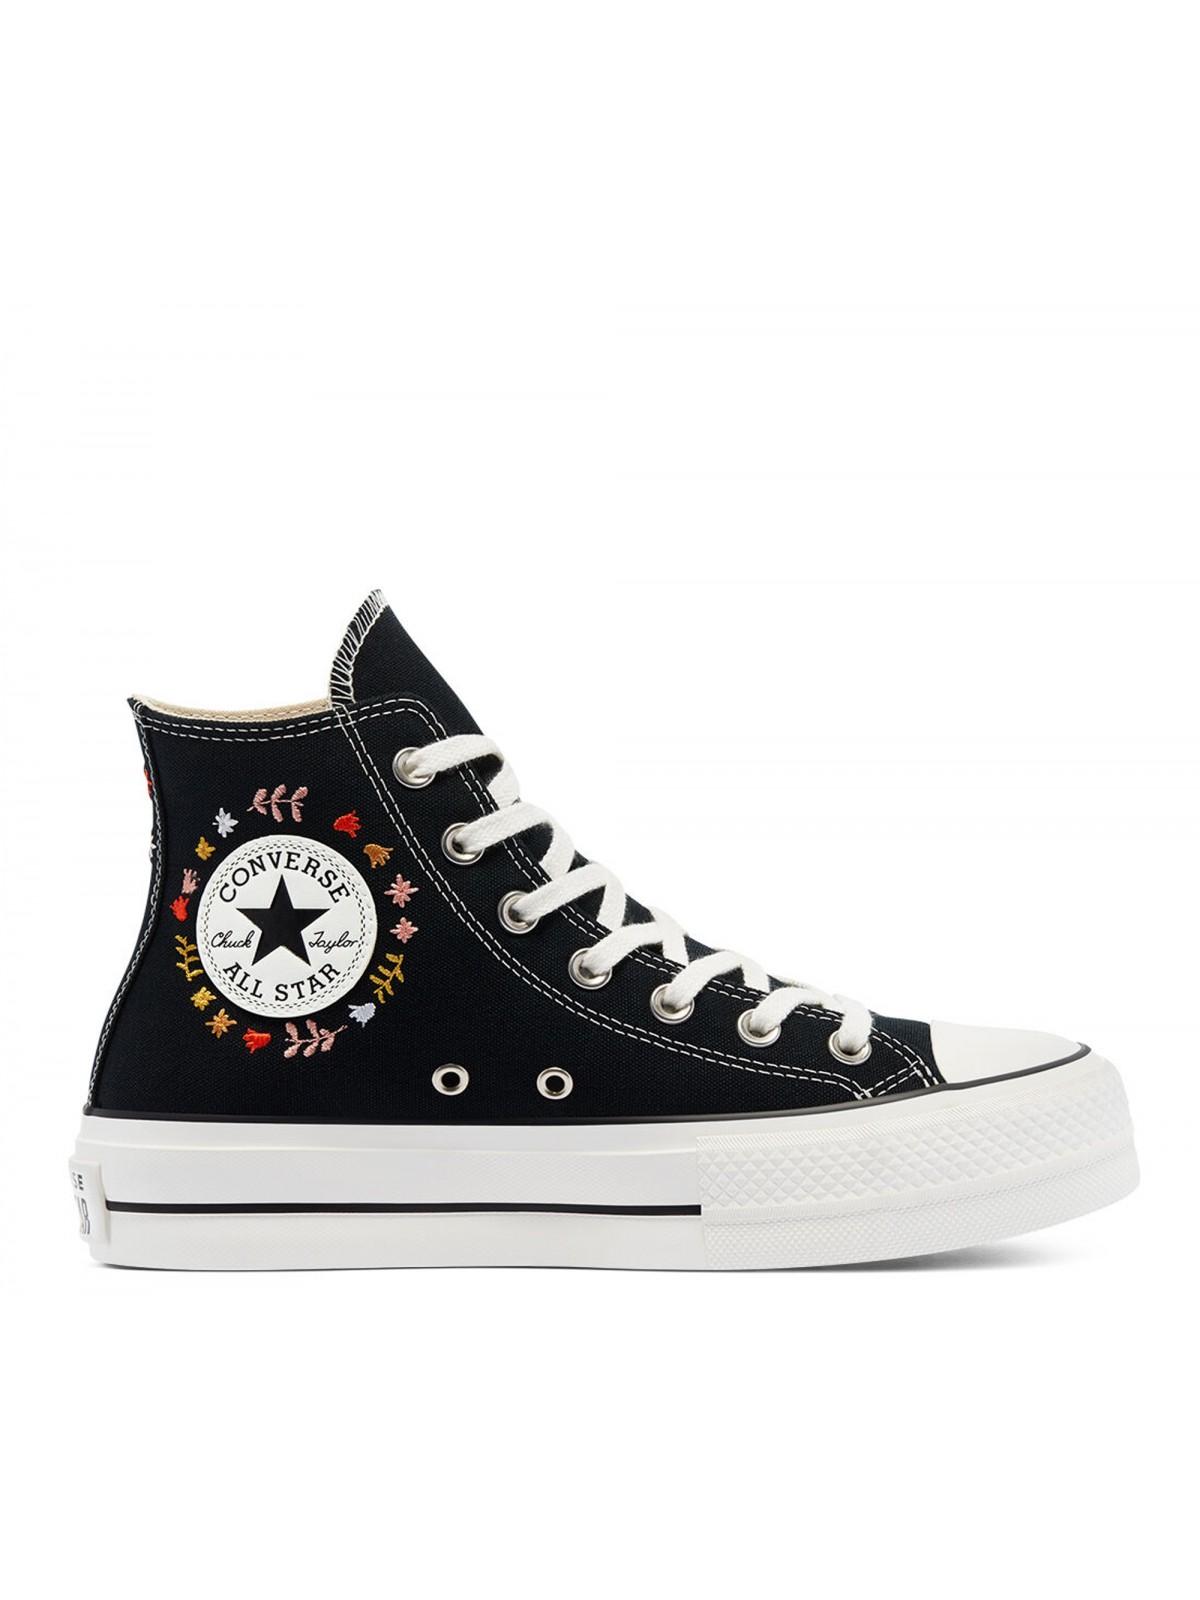 Converse Chuck Taylor all star Lift toile plateforme Fleur noir